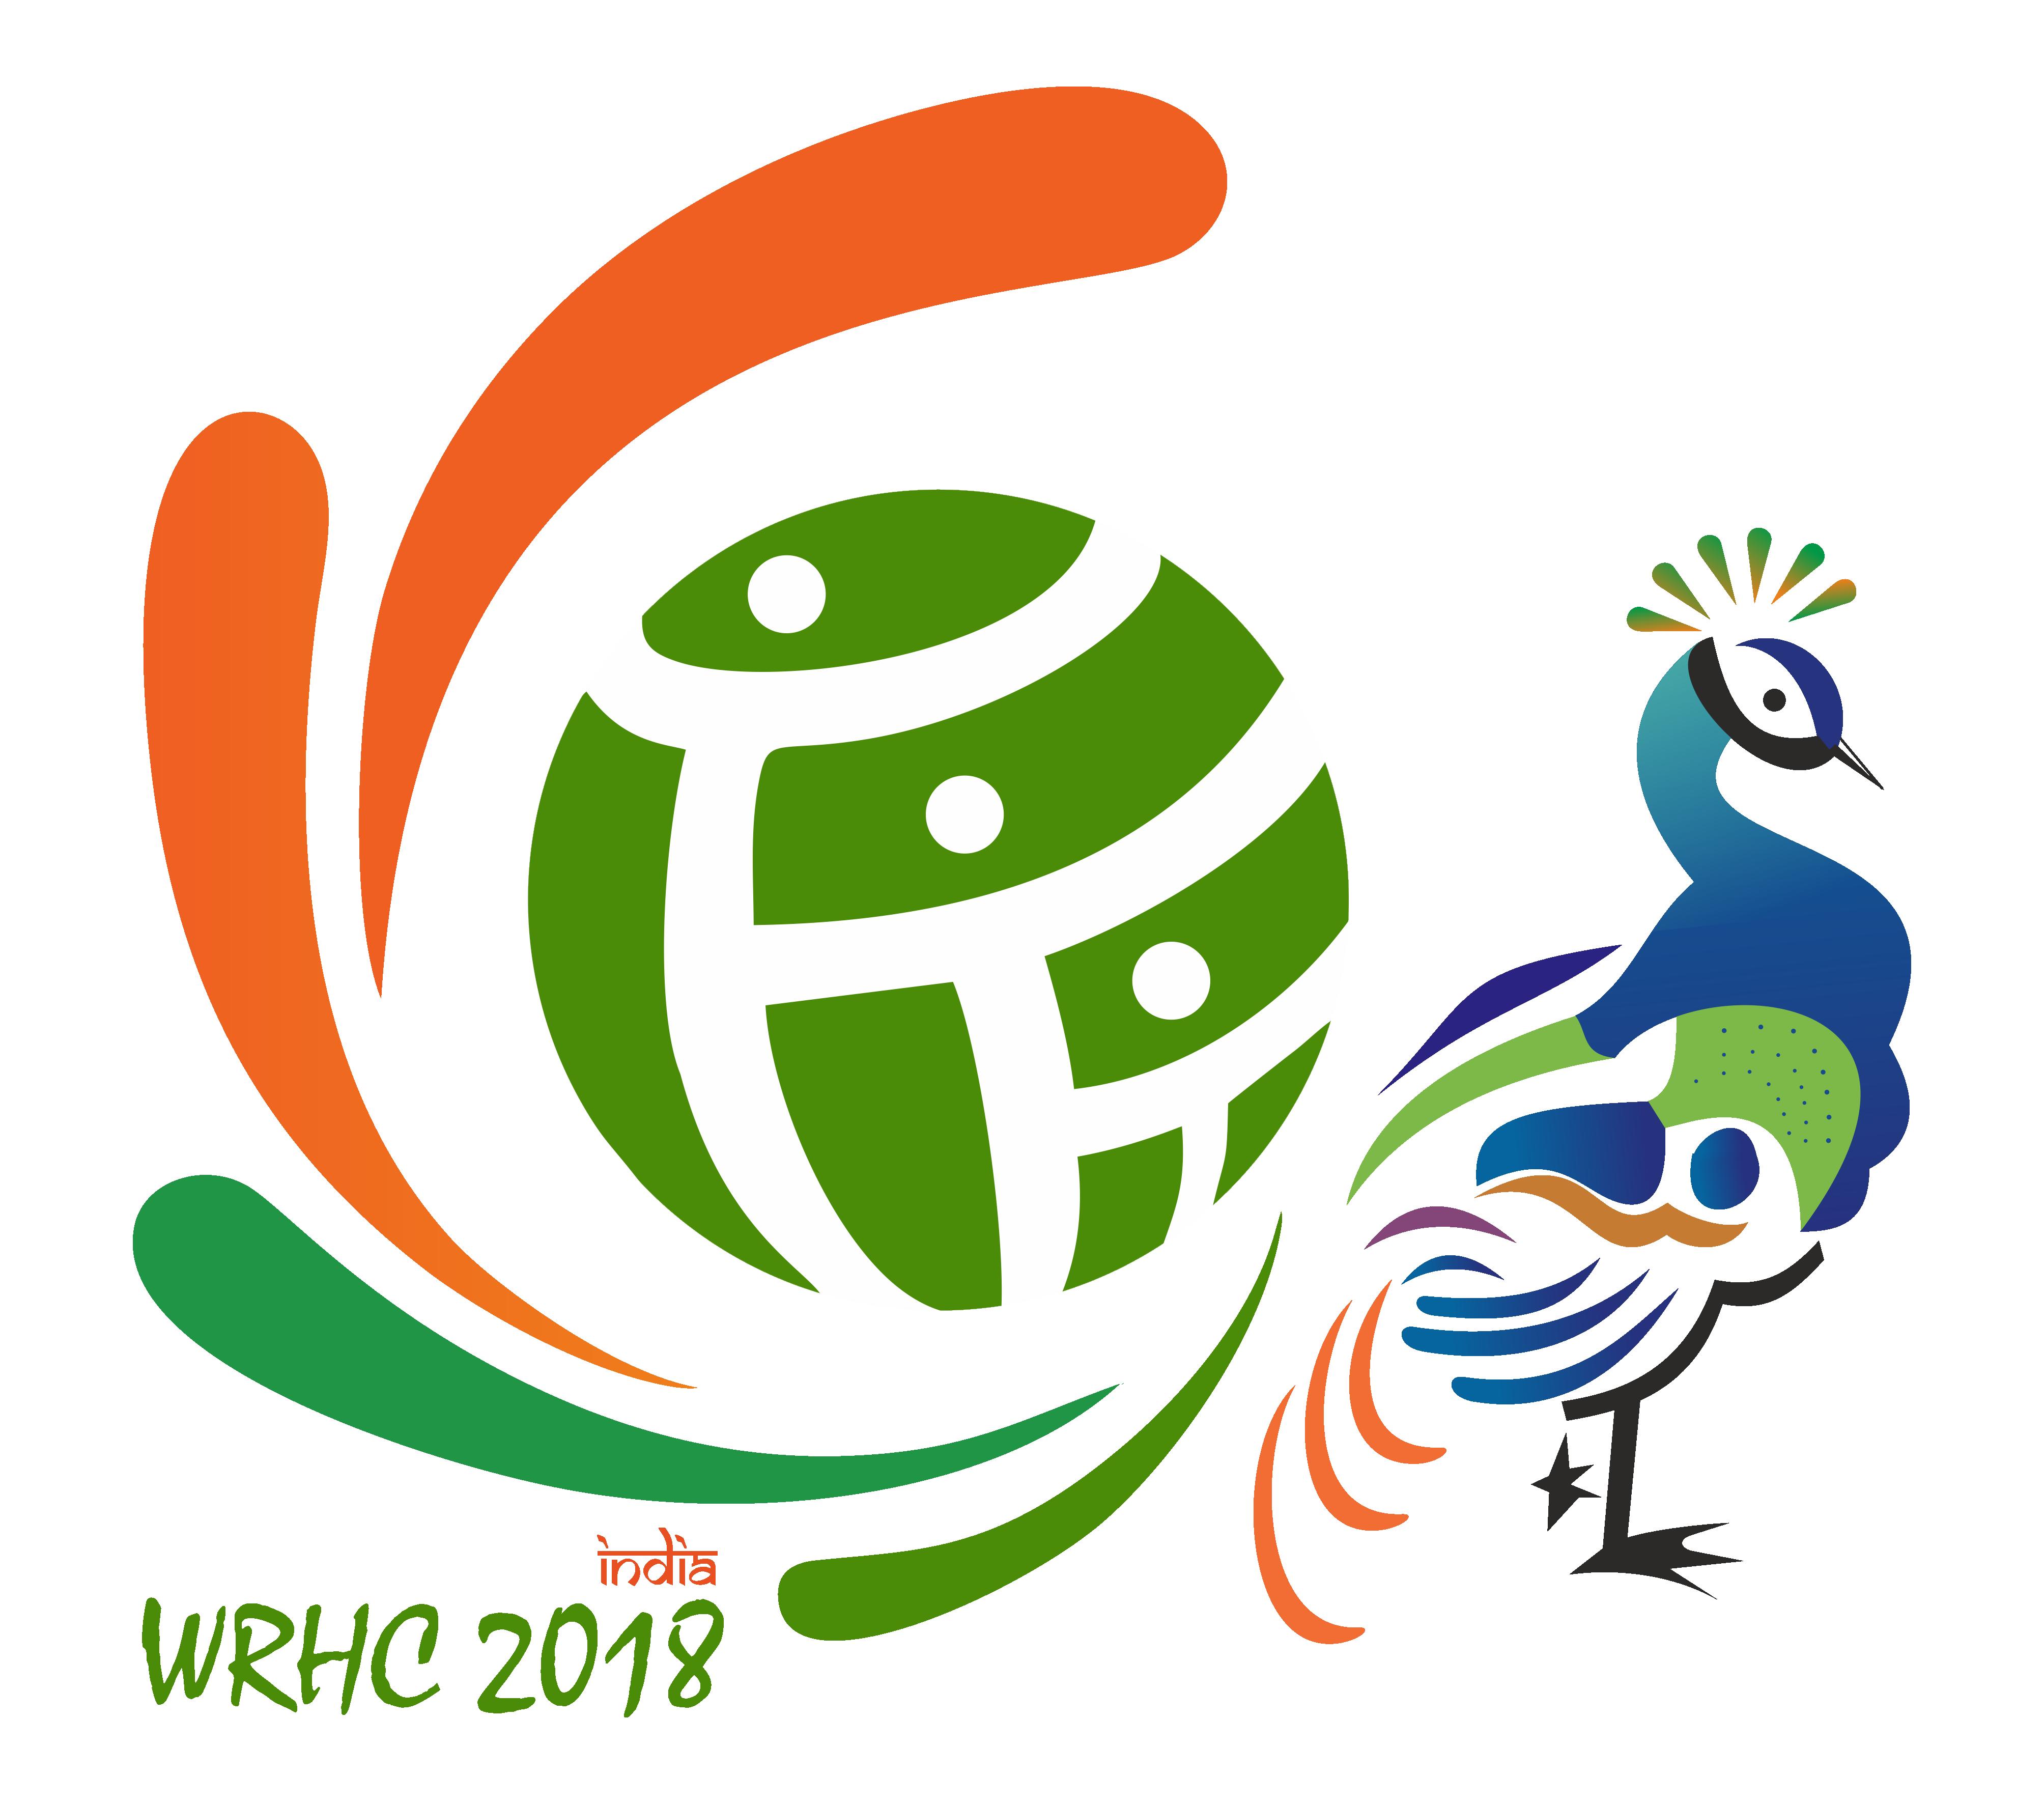 wrhc2018